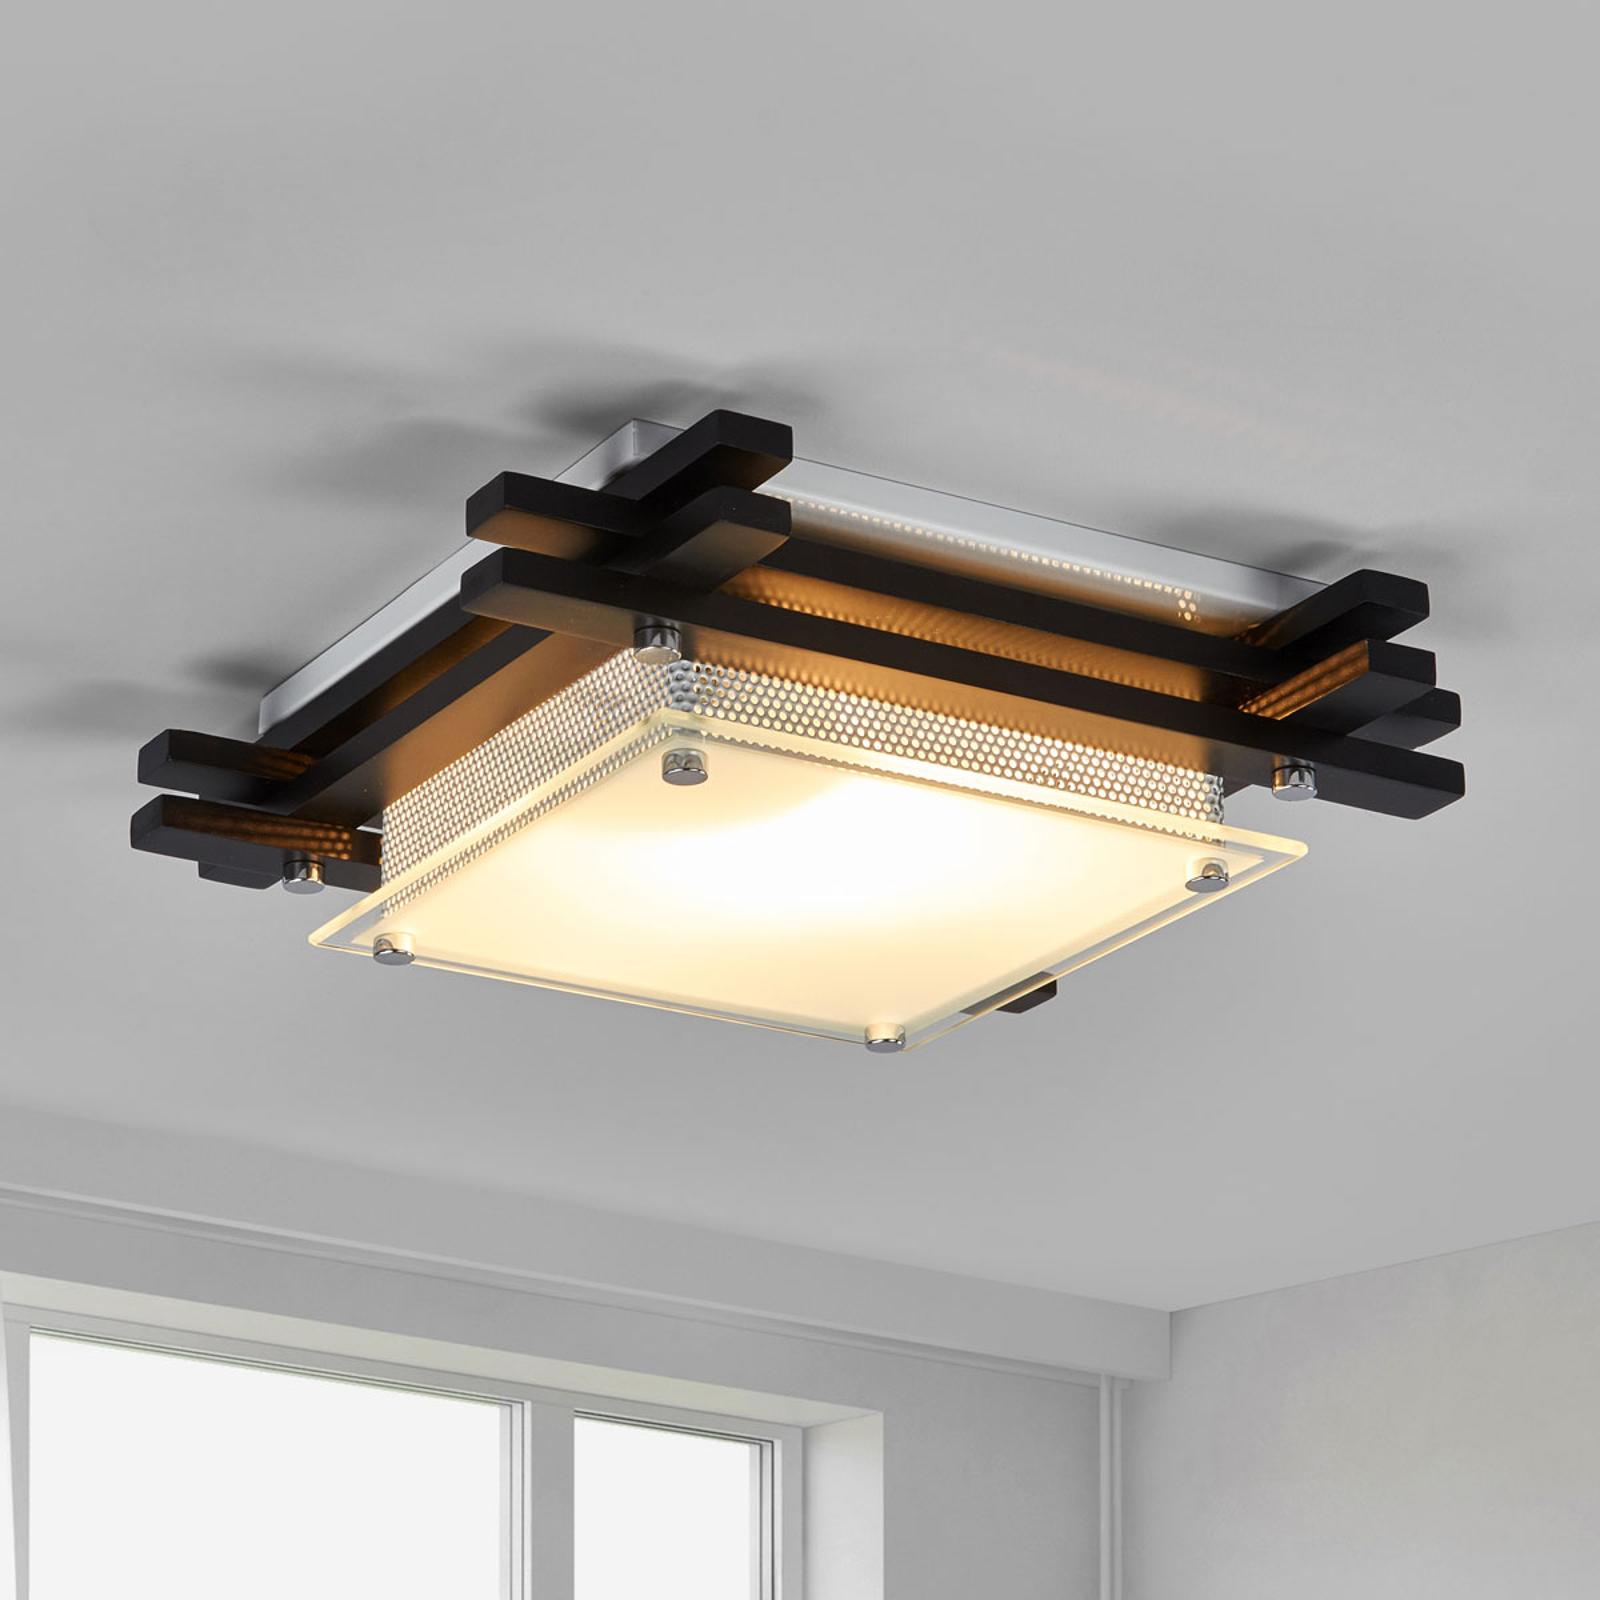 Drewniana lampa sufitowa EDISON ciemna